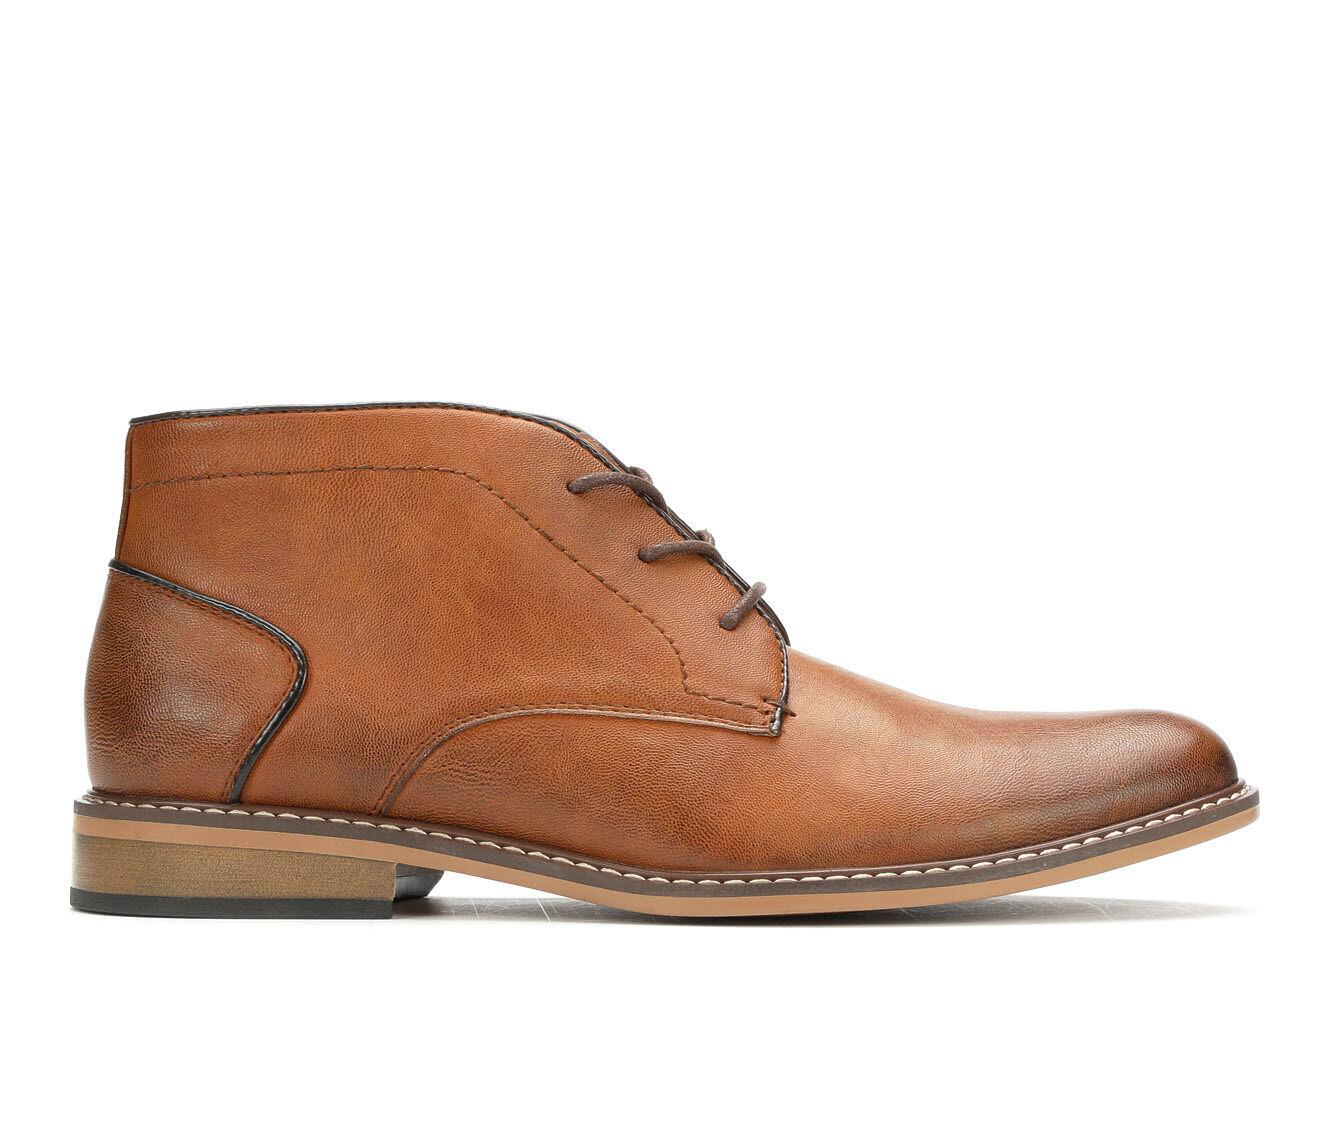 Men's Madden Alakk Chukka Boots Cognac